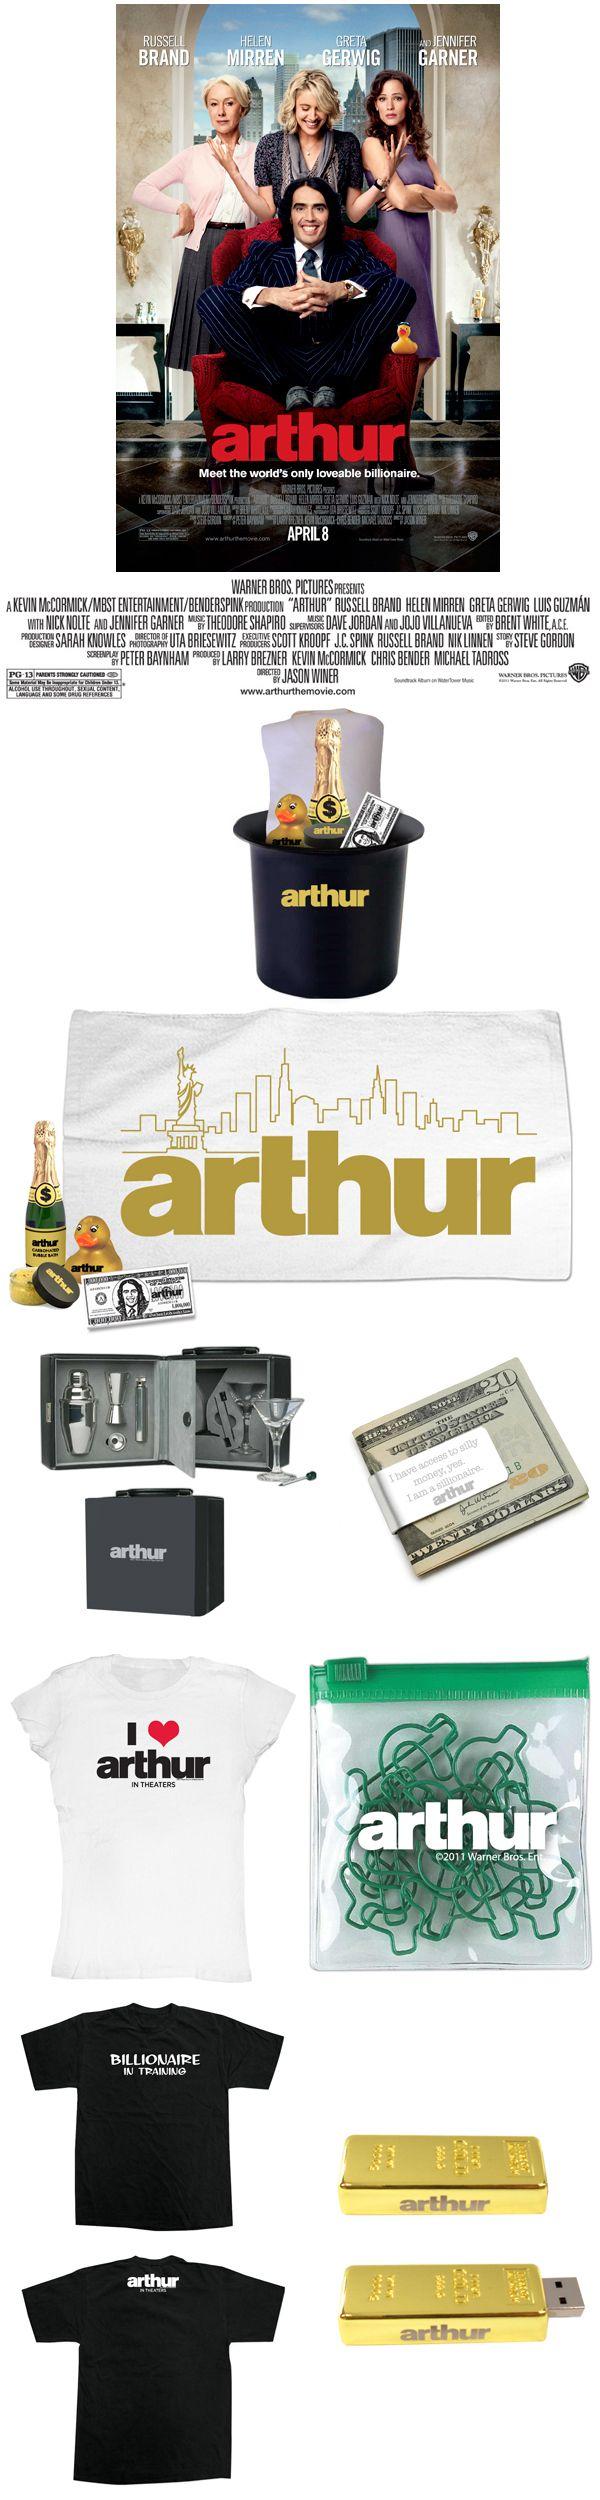 ARTHUR giveaway image